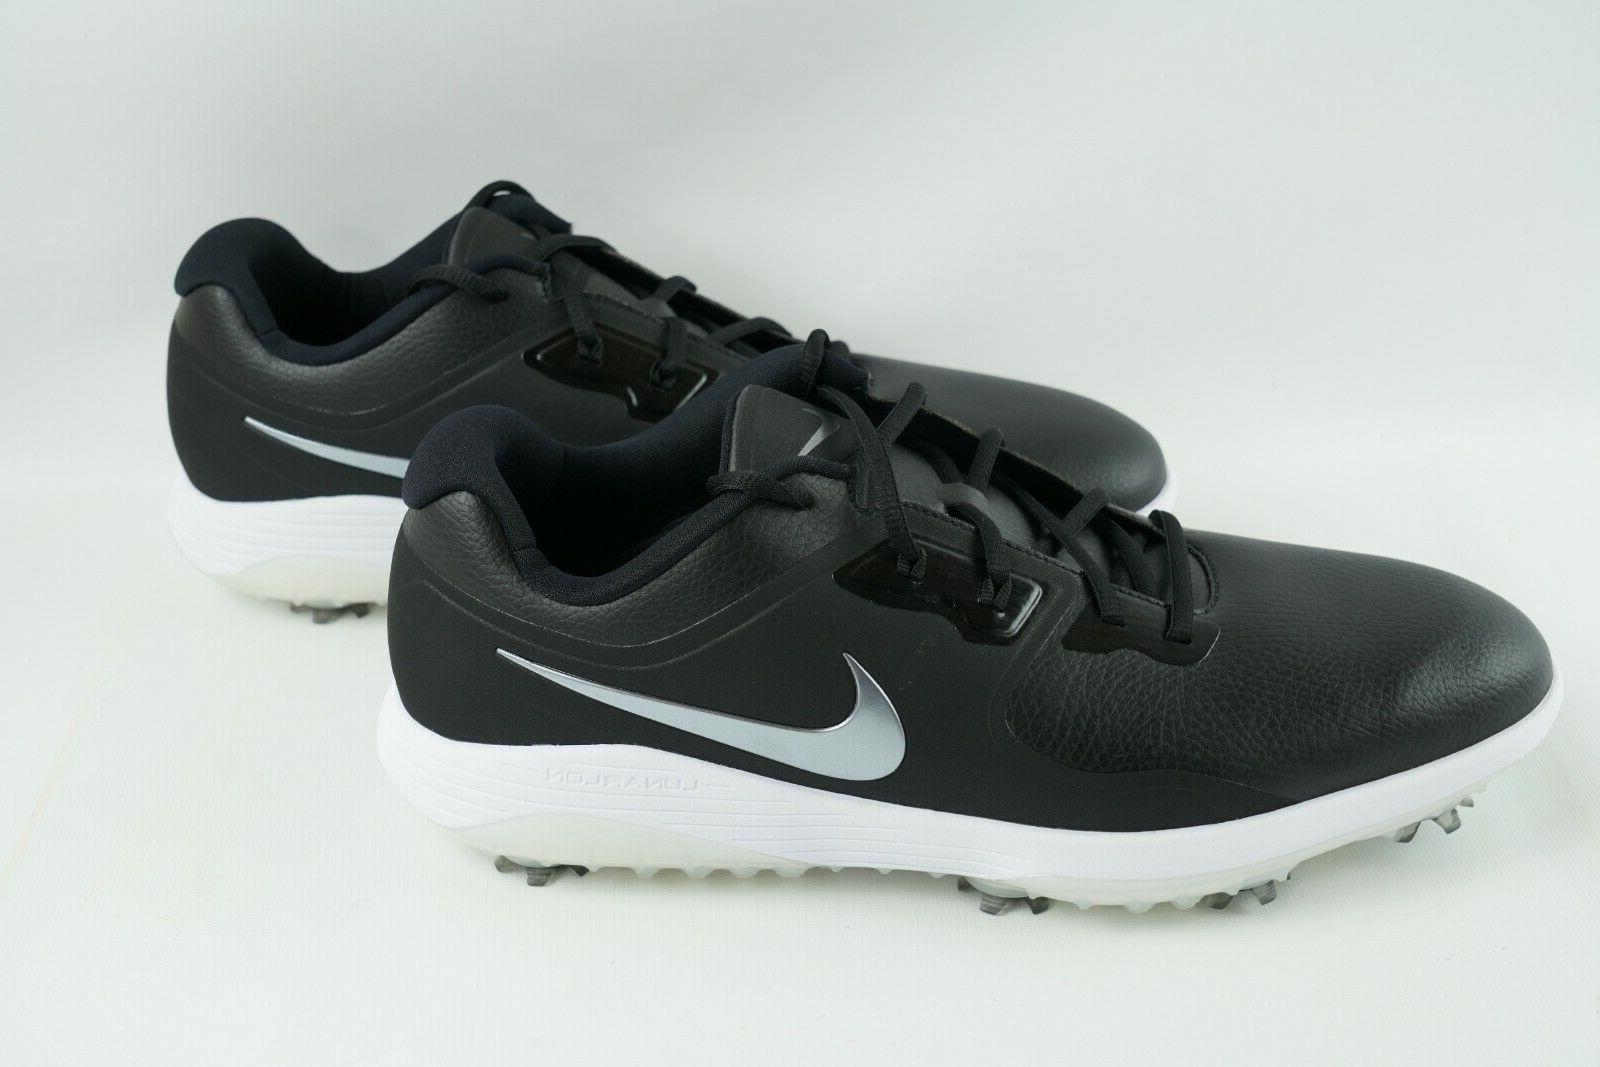 Nike Pro Golf Shoes AQ2197-001 14